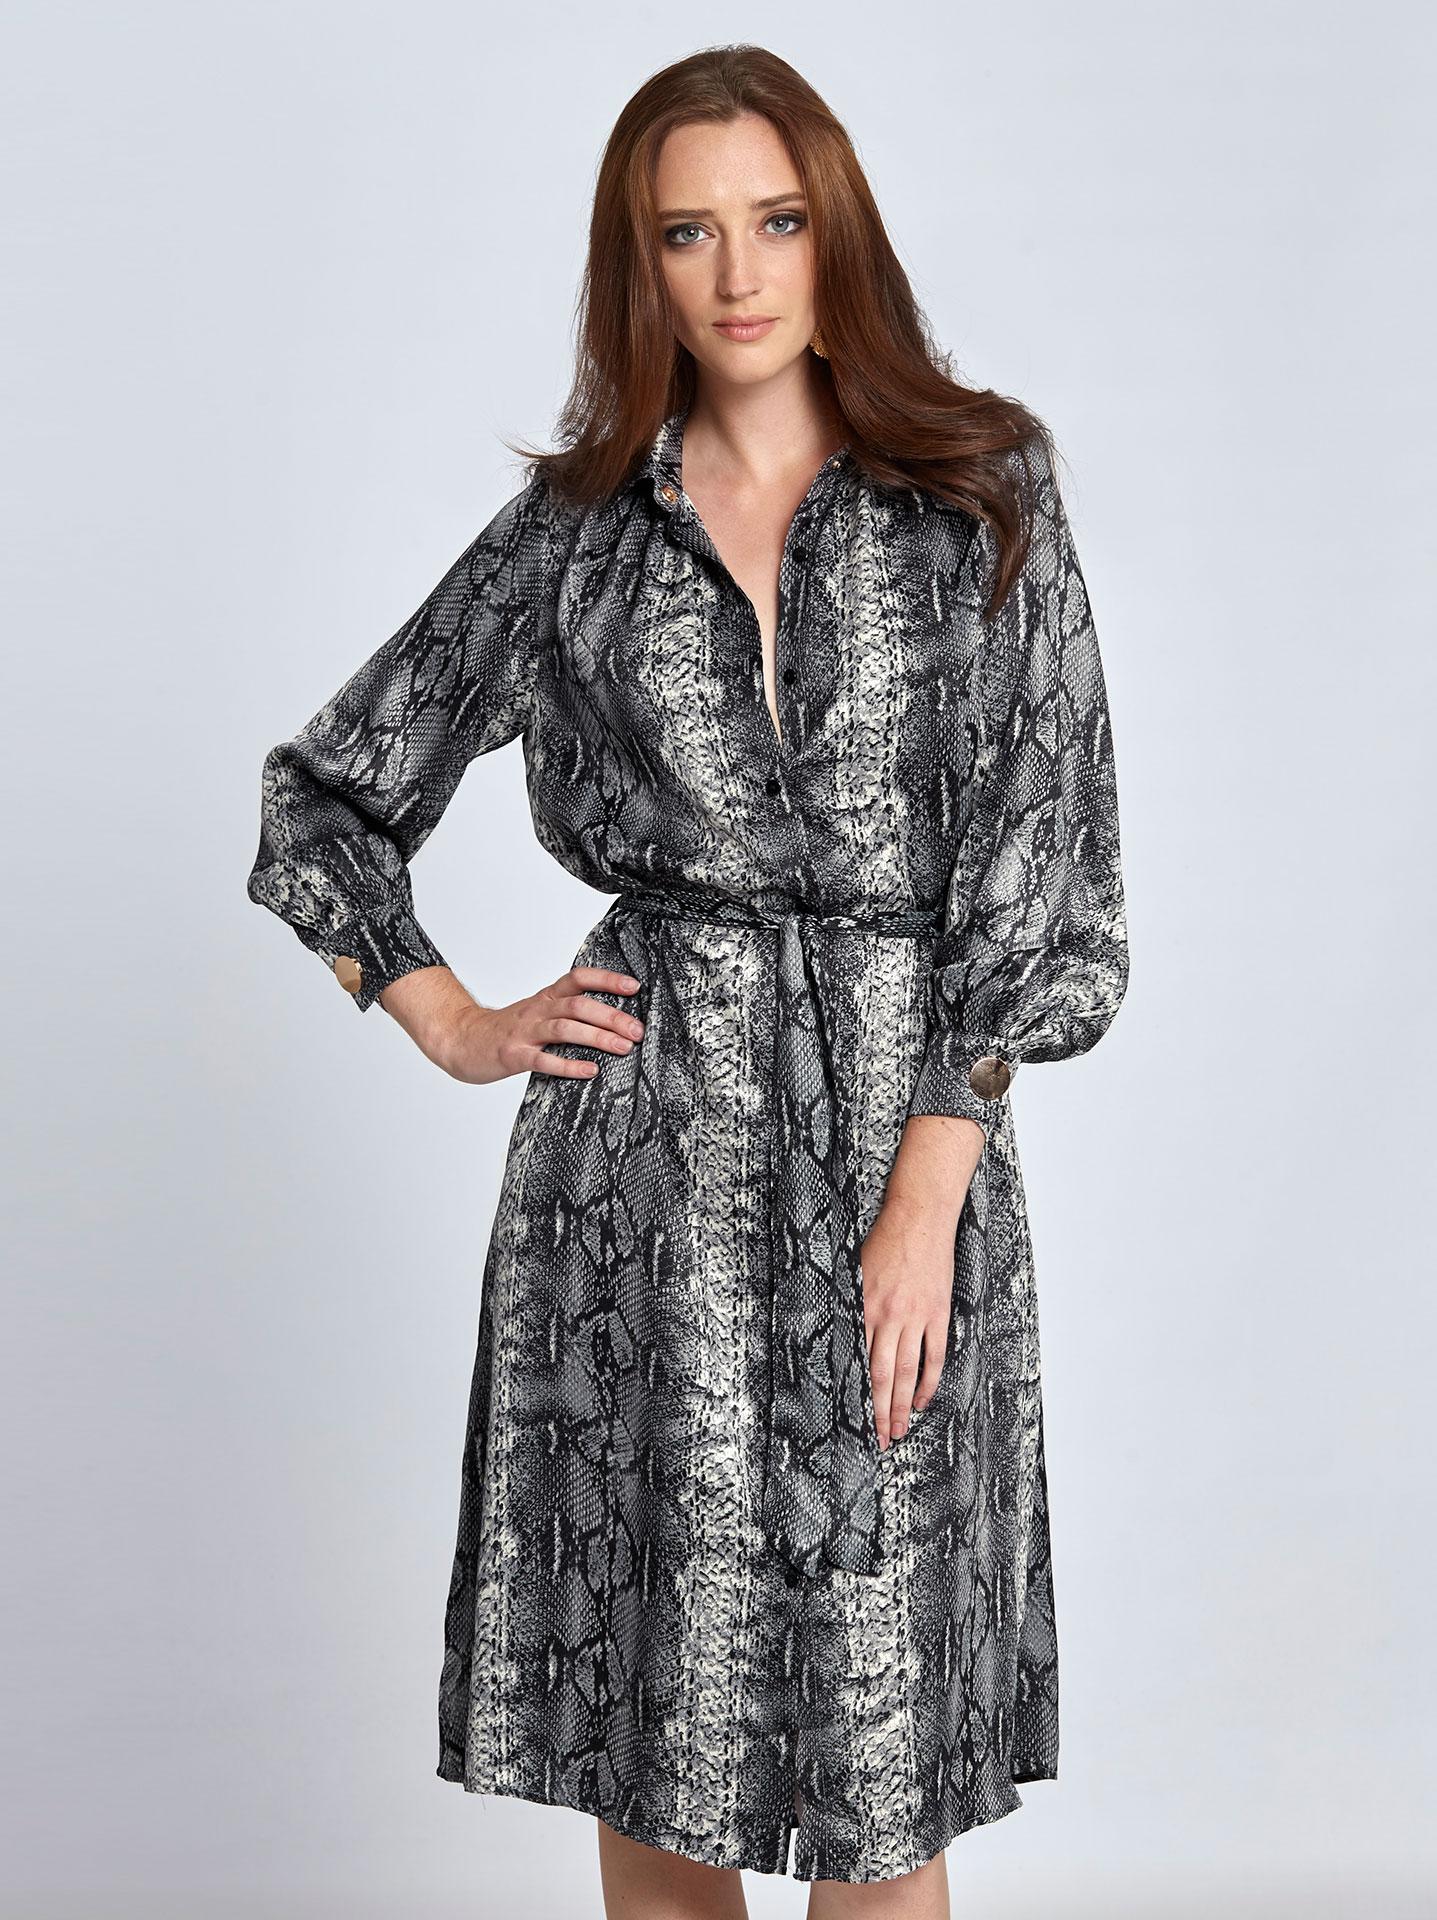 a9a76842b49b Midi φόρεμα με τύπωμα φίδι σε φιδι 1